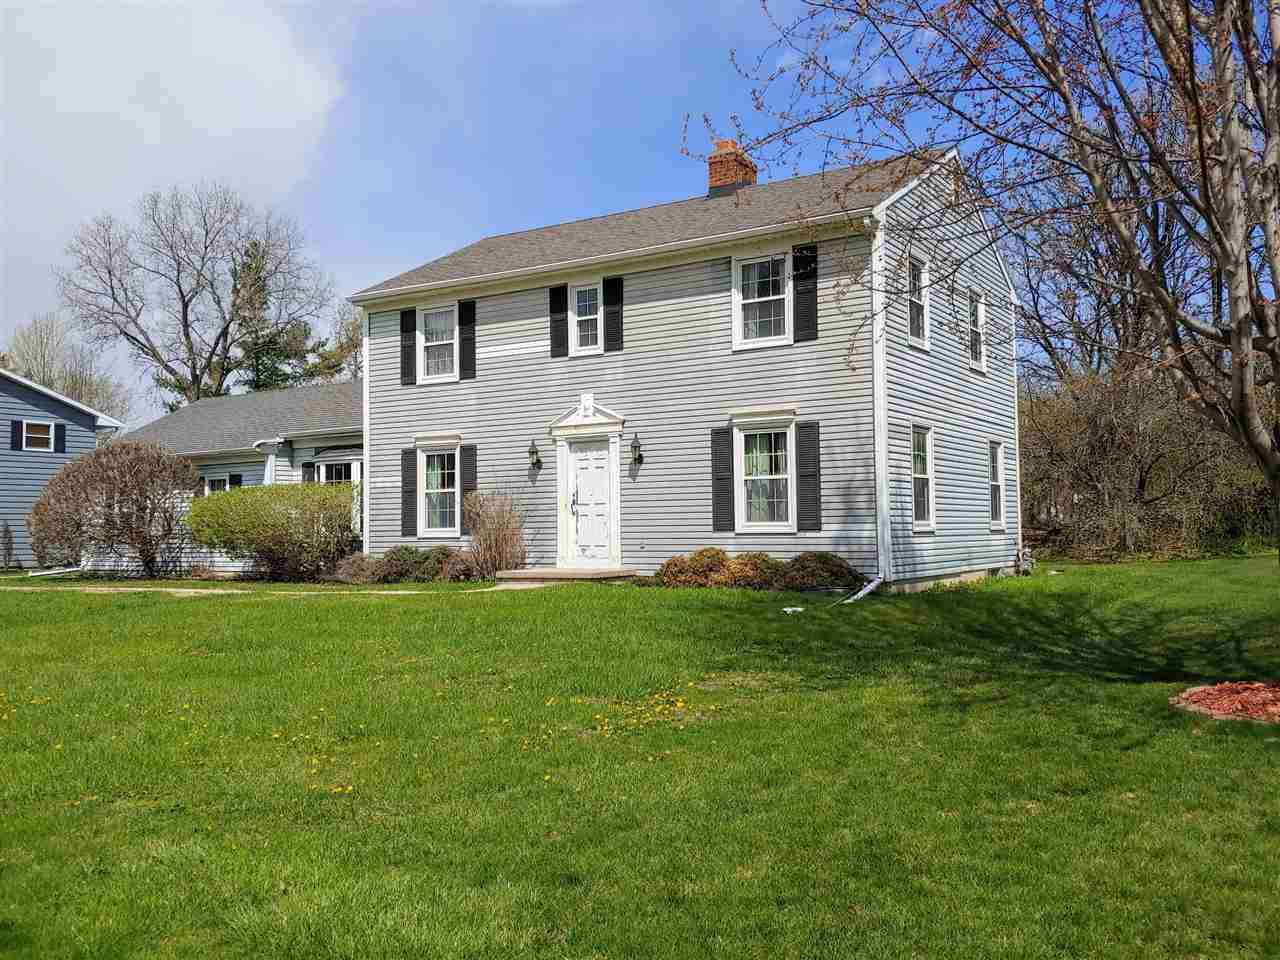 5760 Pembroke Dr, Fitchburg, Wisconsin 53711, 3 Bedrooms Bedrooms, ,2 BathroomsBathrooms,Single Family,For Sale,5760 Pembroke Dr,2,1906941